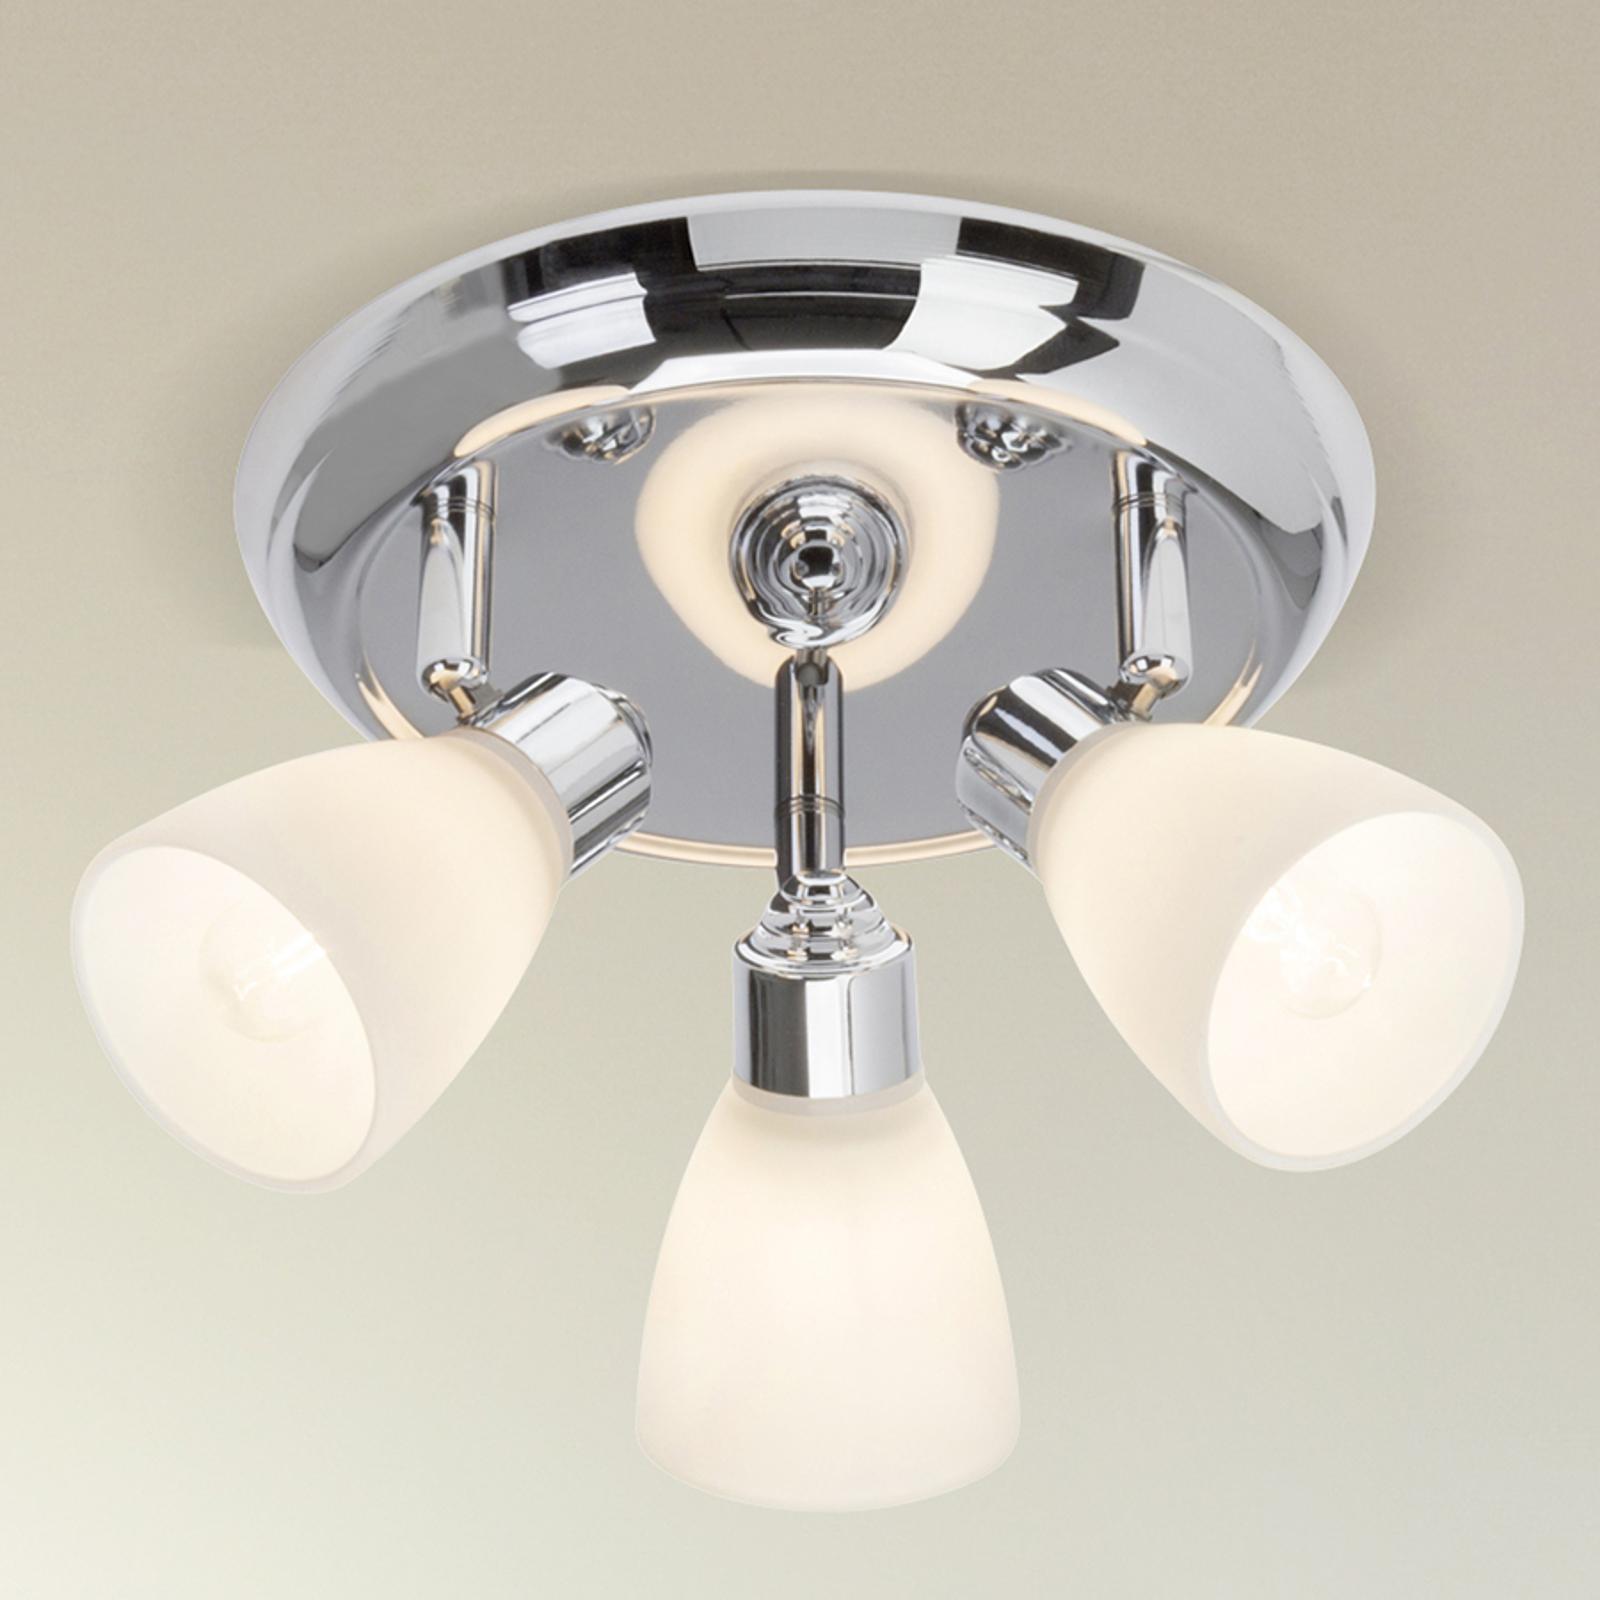 Kensington - trzyramienna lampa sufitowa, chrom